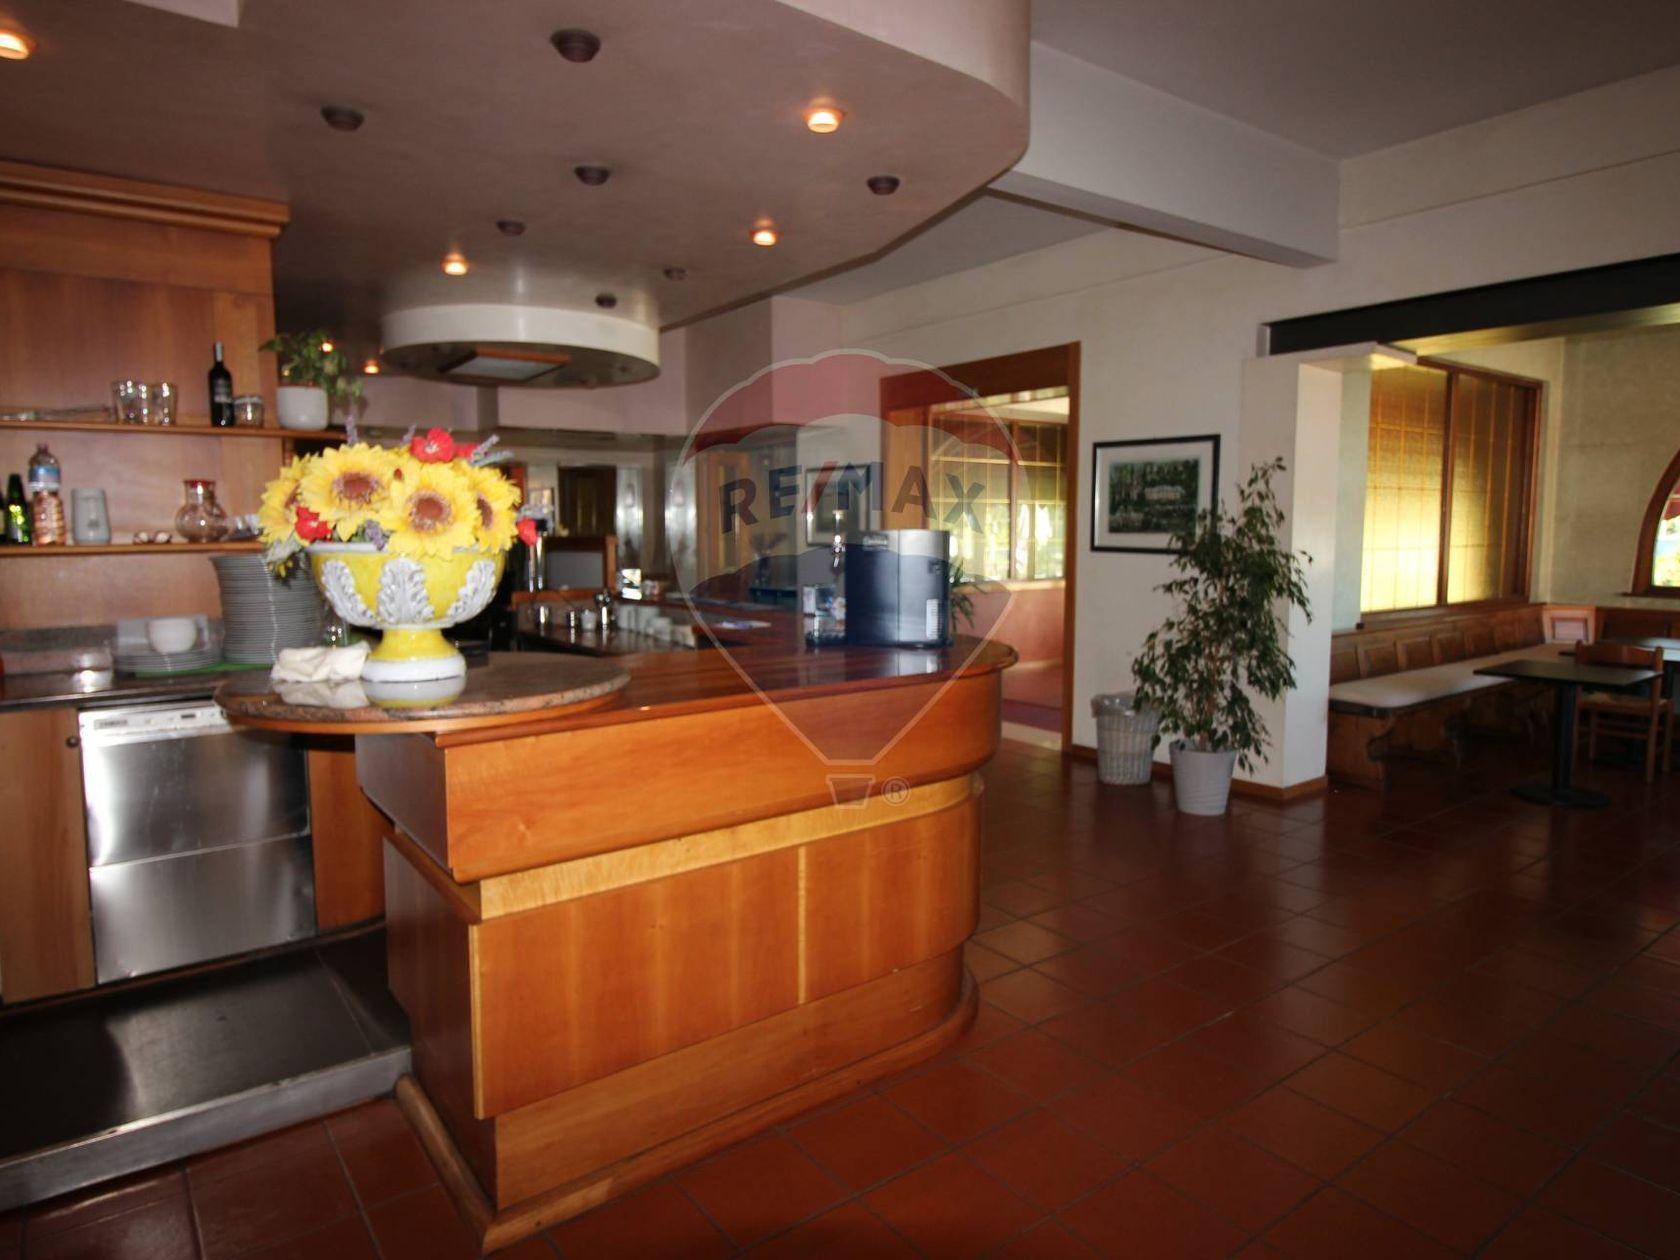 Albergo/Hotel Valmarana, Altavilla Vicentina, VI Vendita - Foto 7